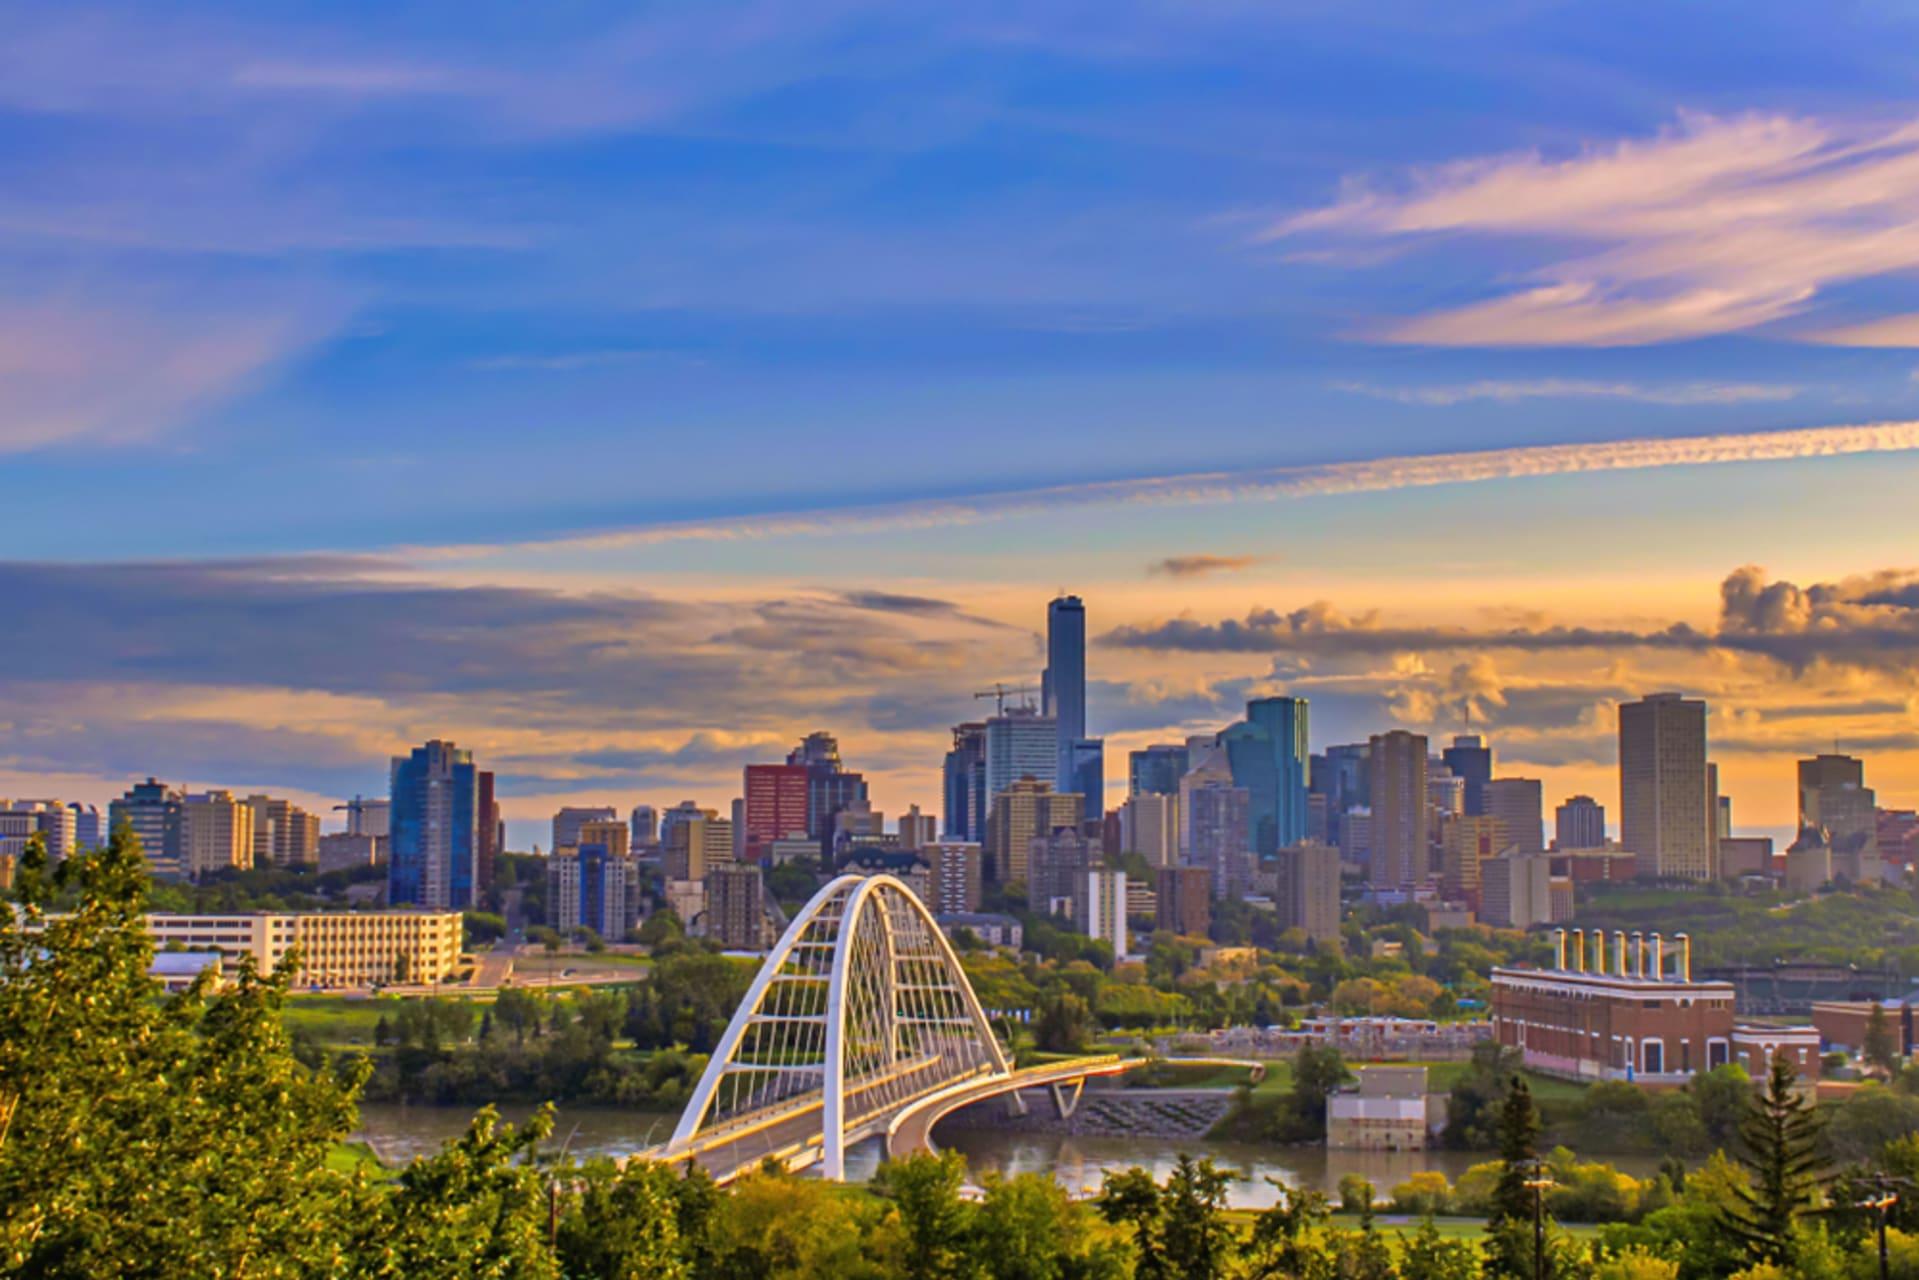 Edmonton - Edmonton - North America's most northerly large city